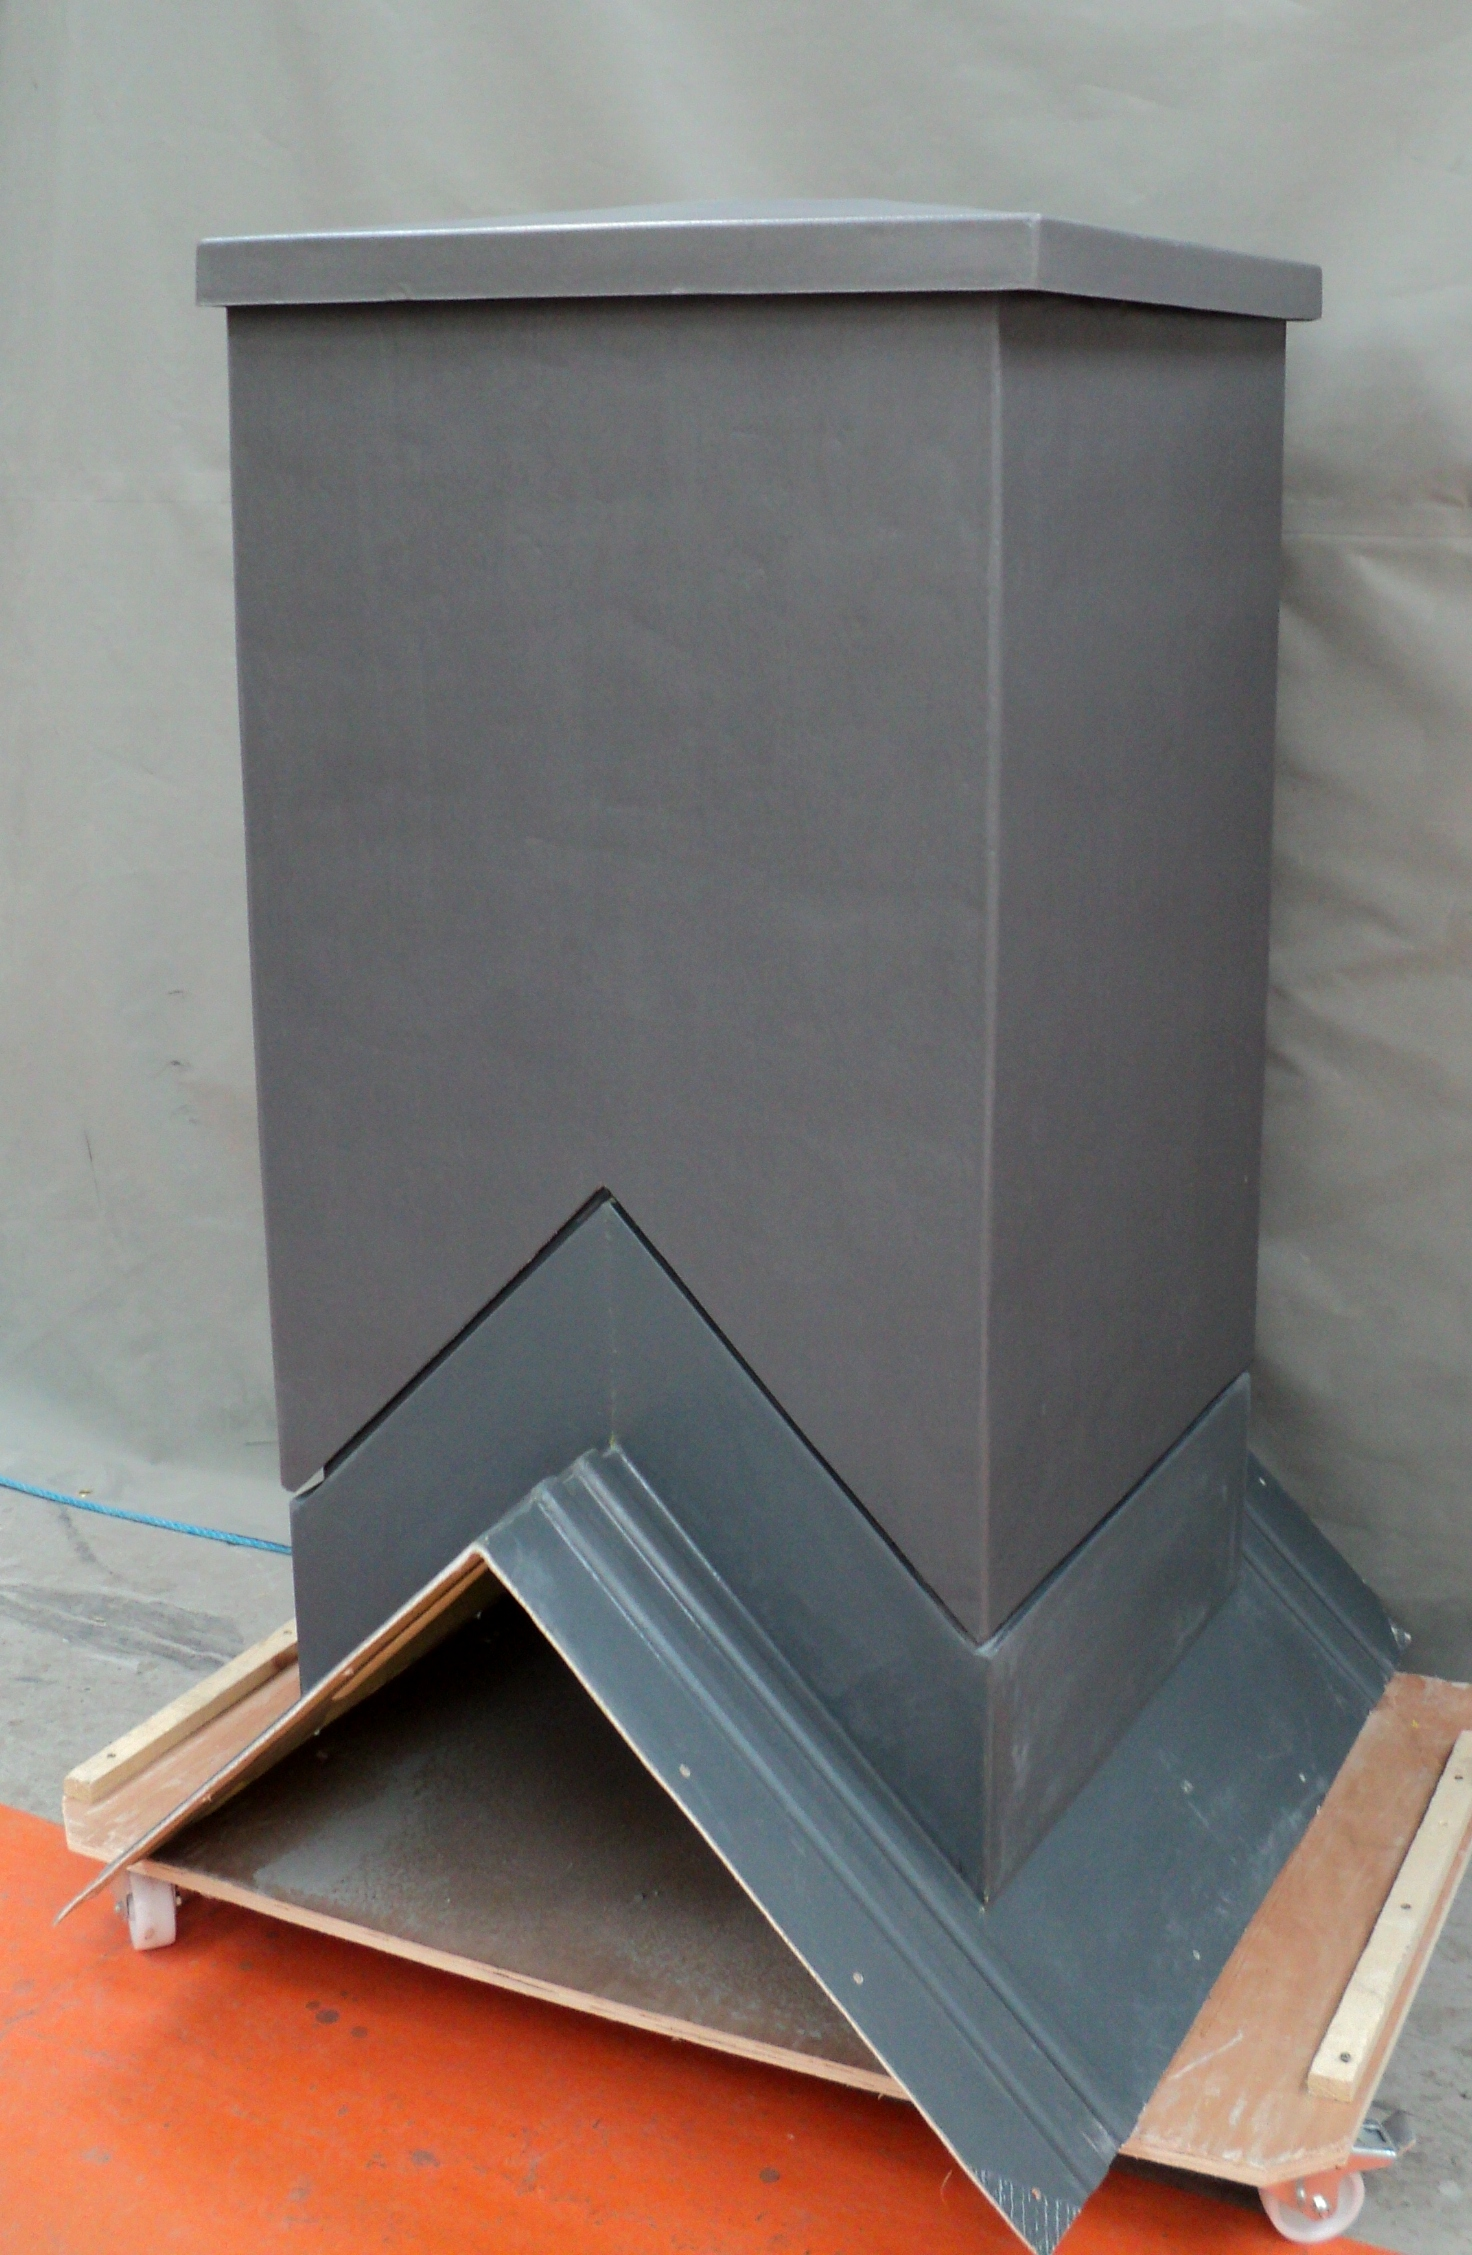 Aluminium effect chimney